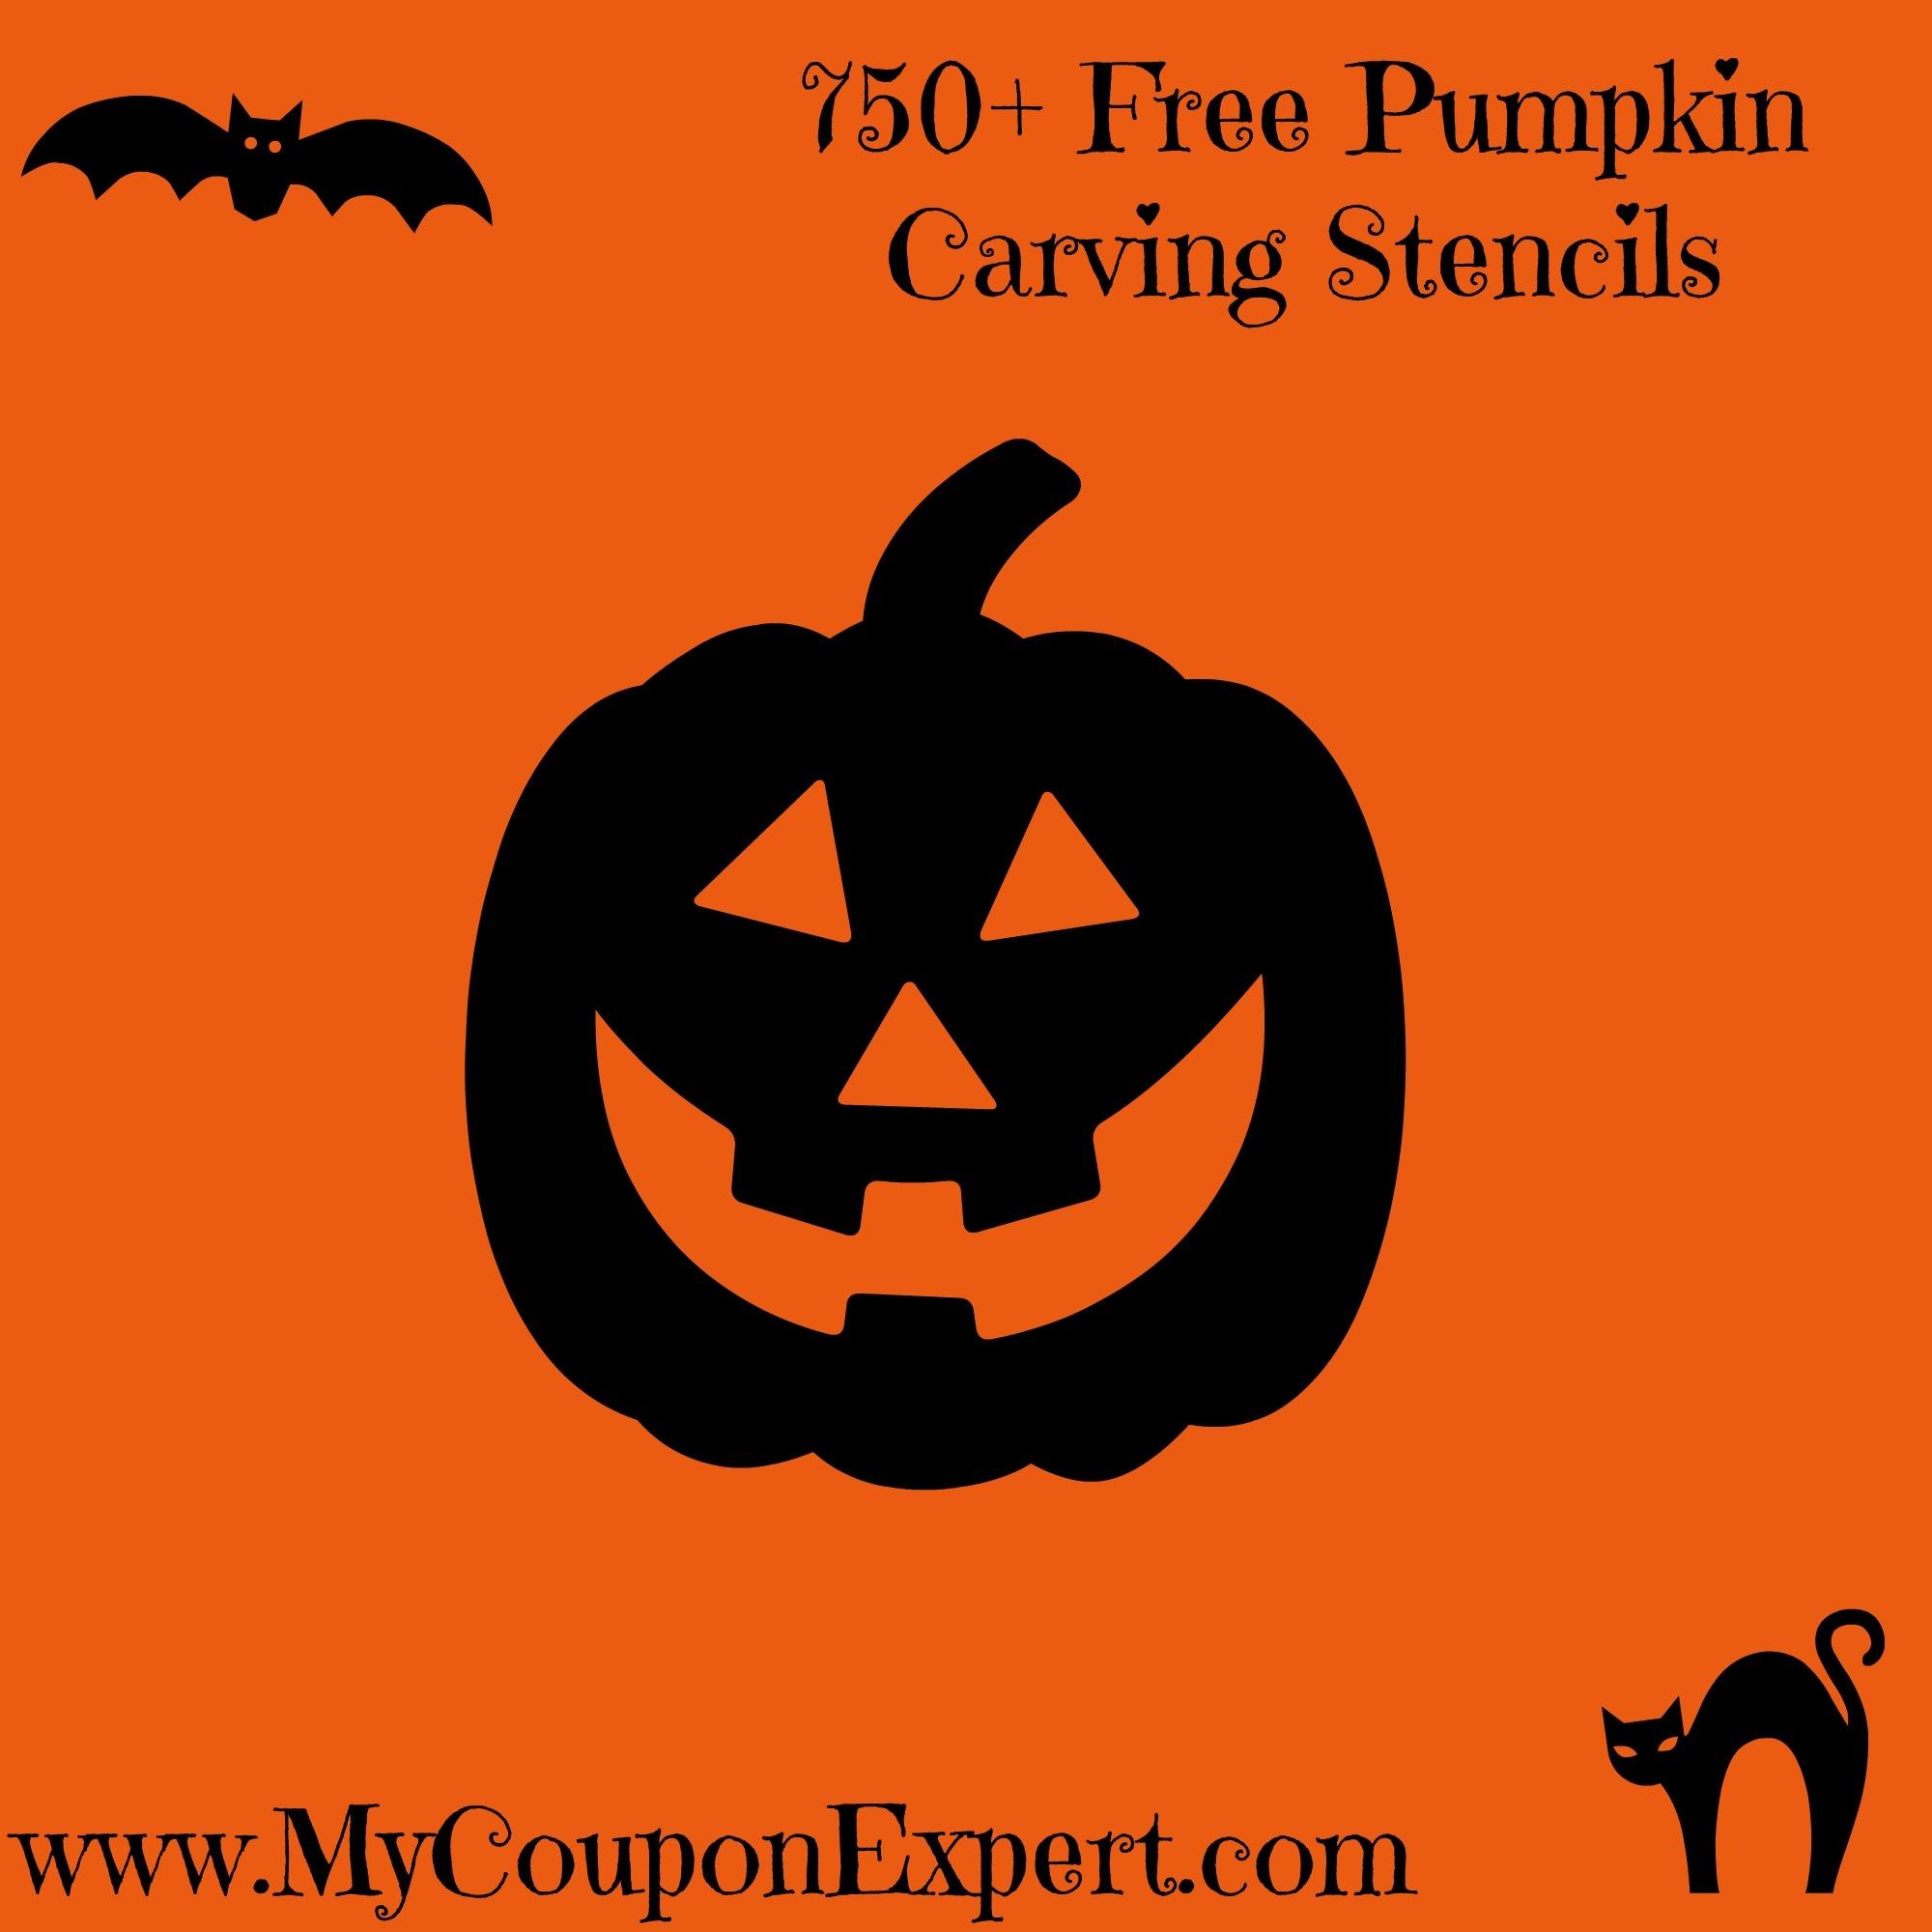 750+ Free Pumpkin Carving Stencils · - Free Printable Pumpkin Carving Stencils